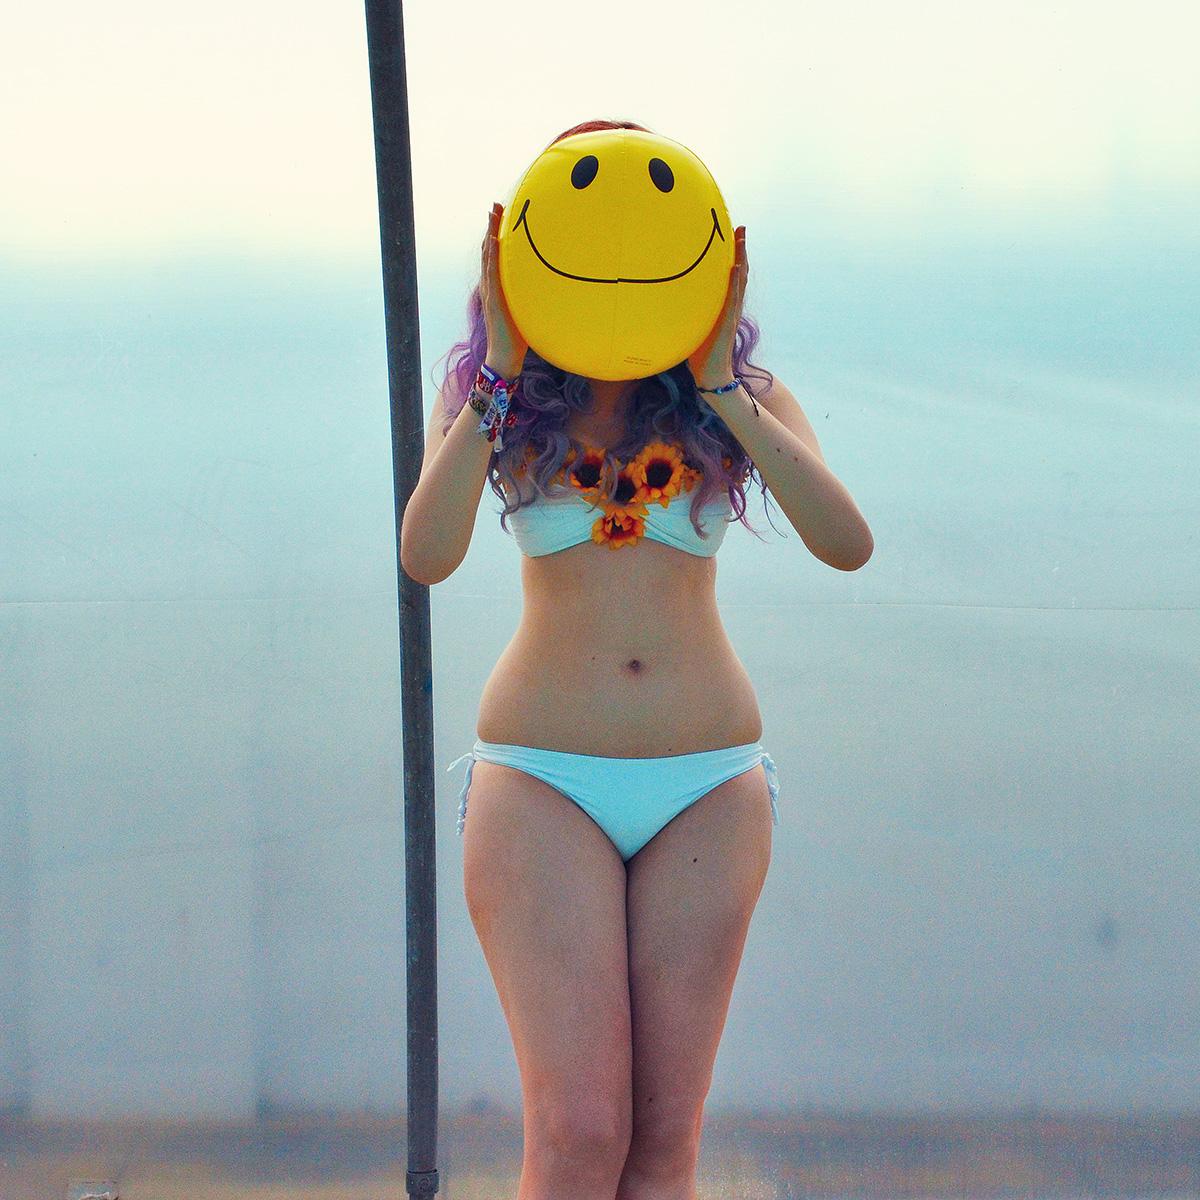 How To Feel Confident In a Bikini